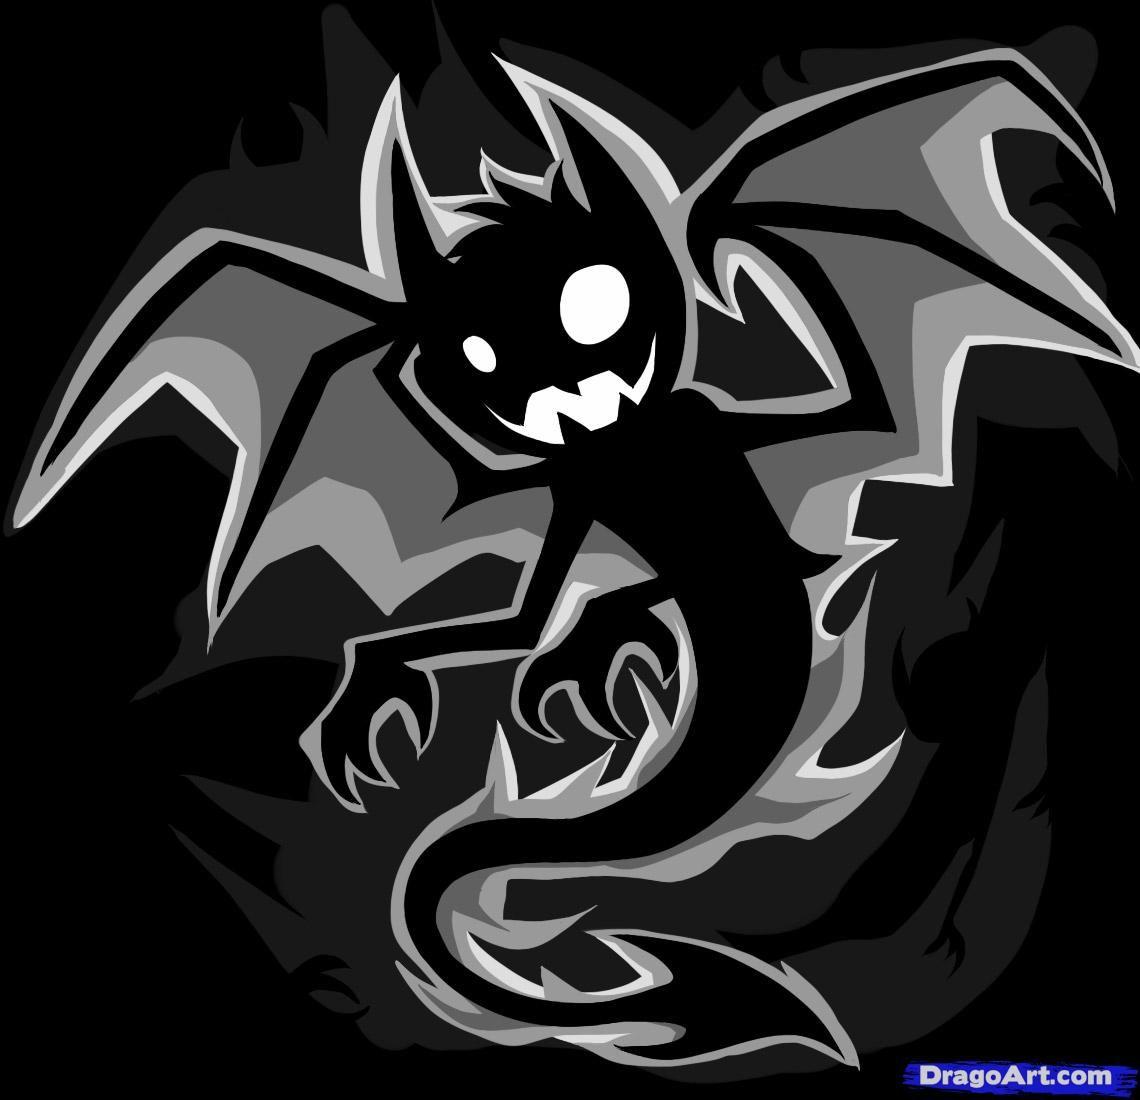 How To Draw An Anime Demon By Dawn Evil Anime Anime Demon